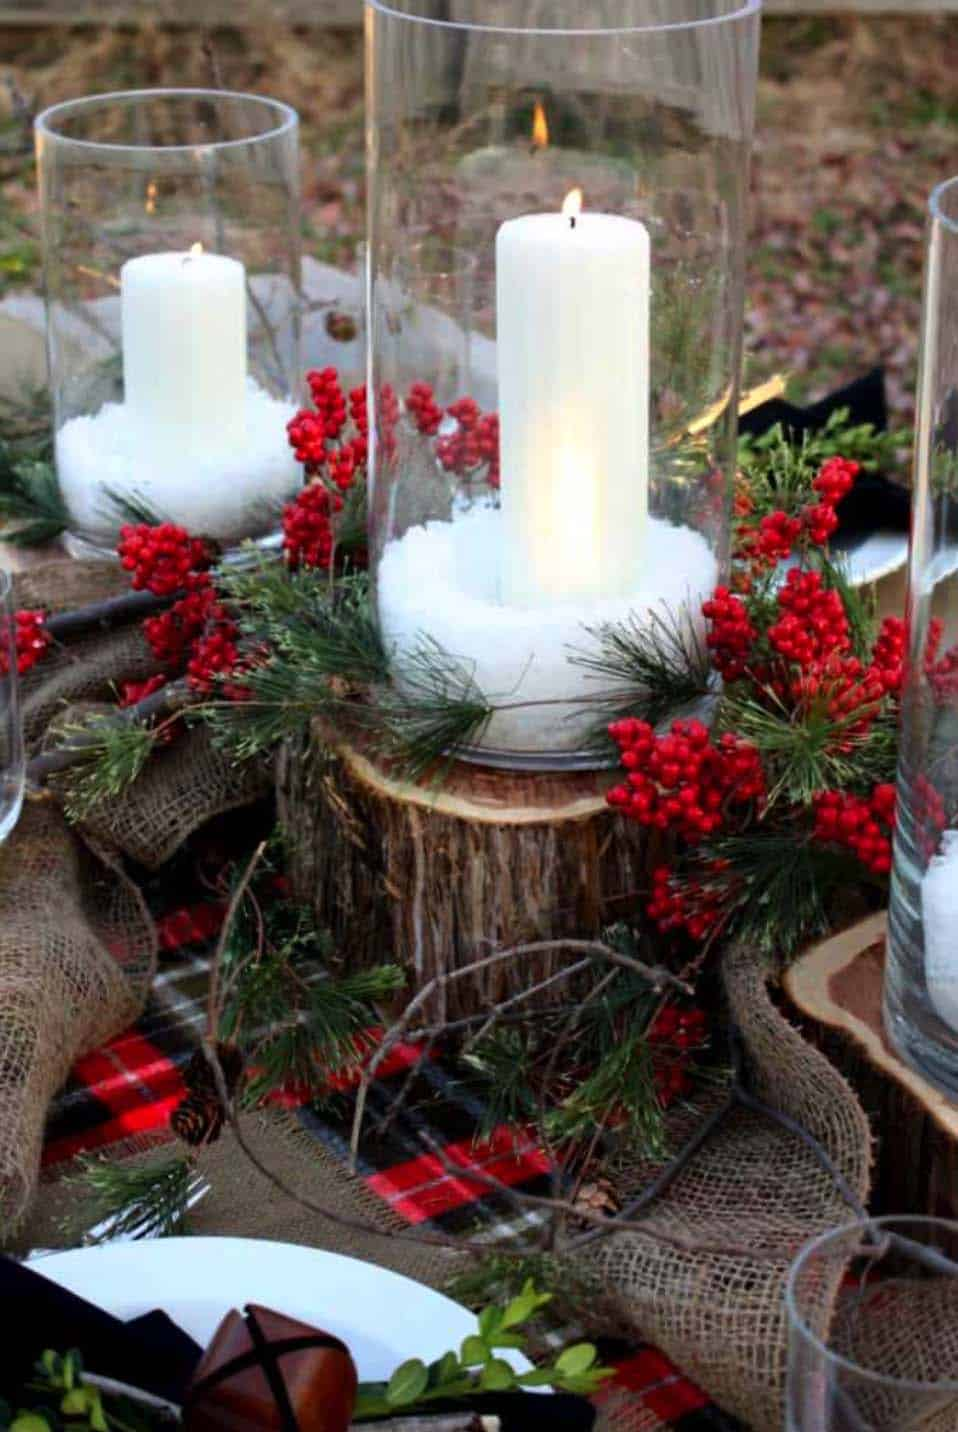 Inspiring Dining Table Christmas Decor Ideas-23-1 Kindesign